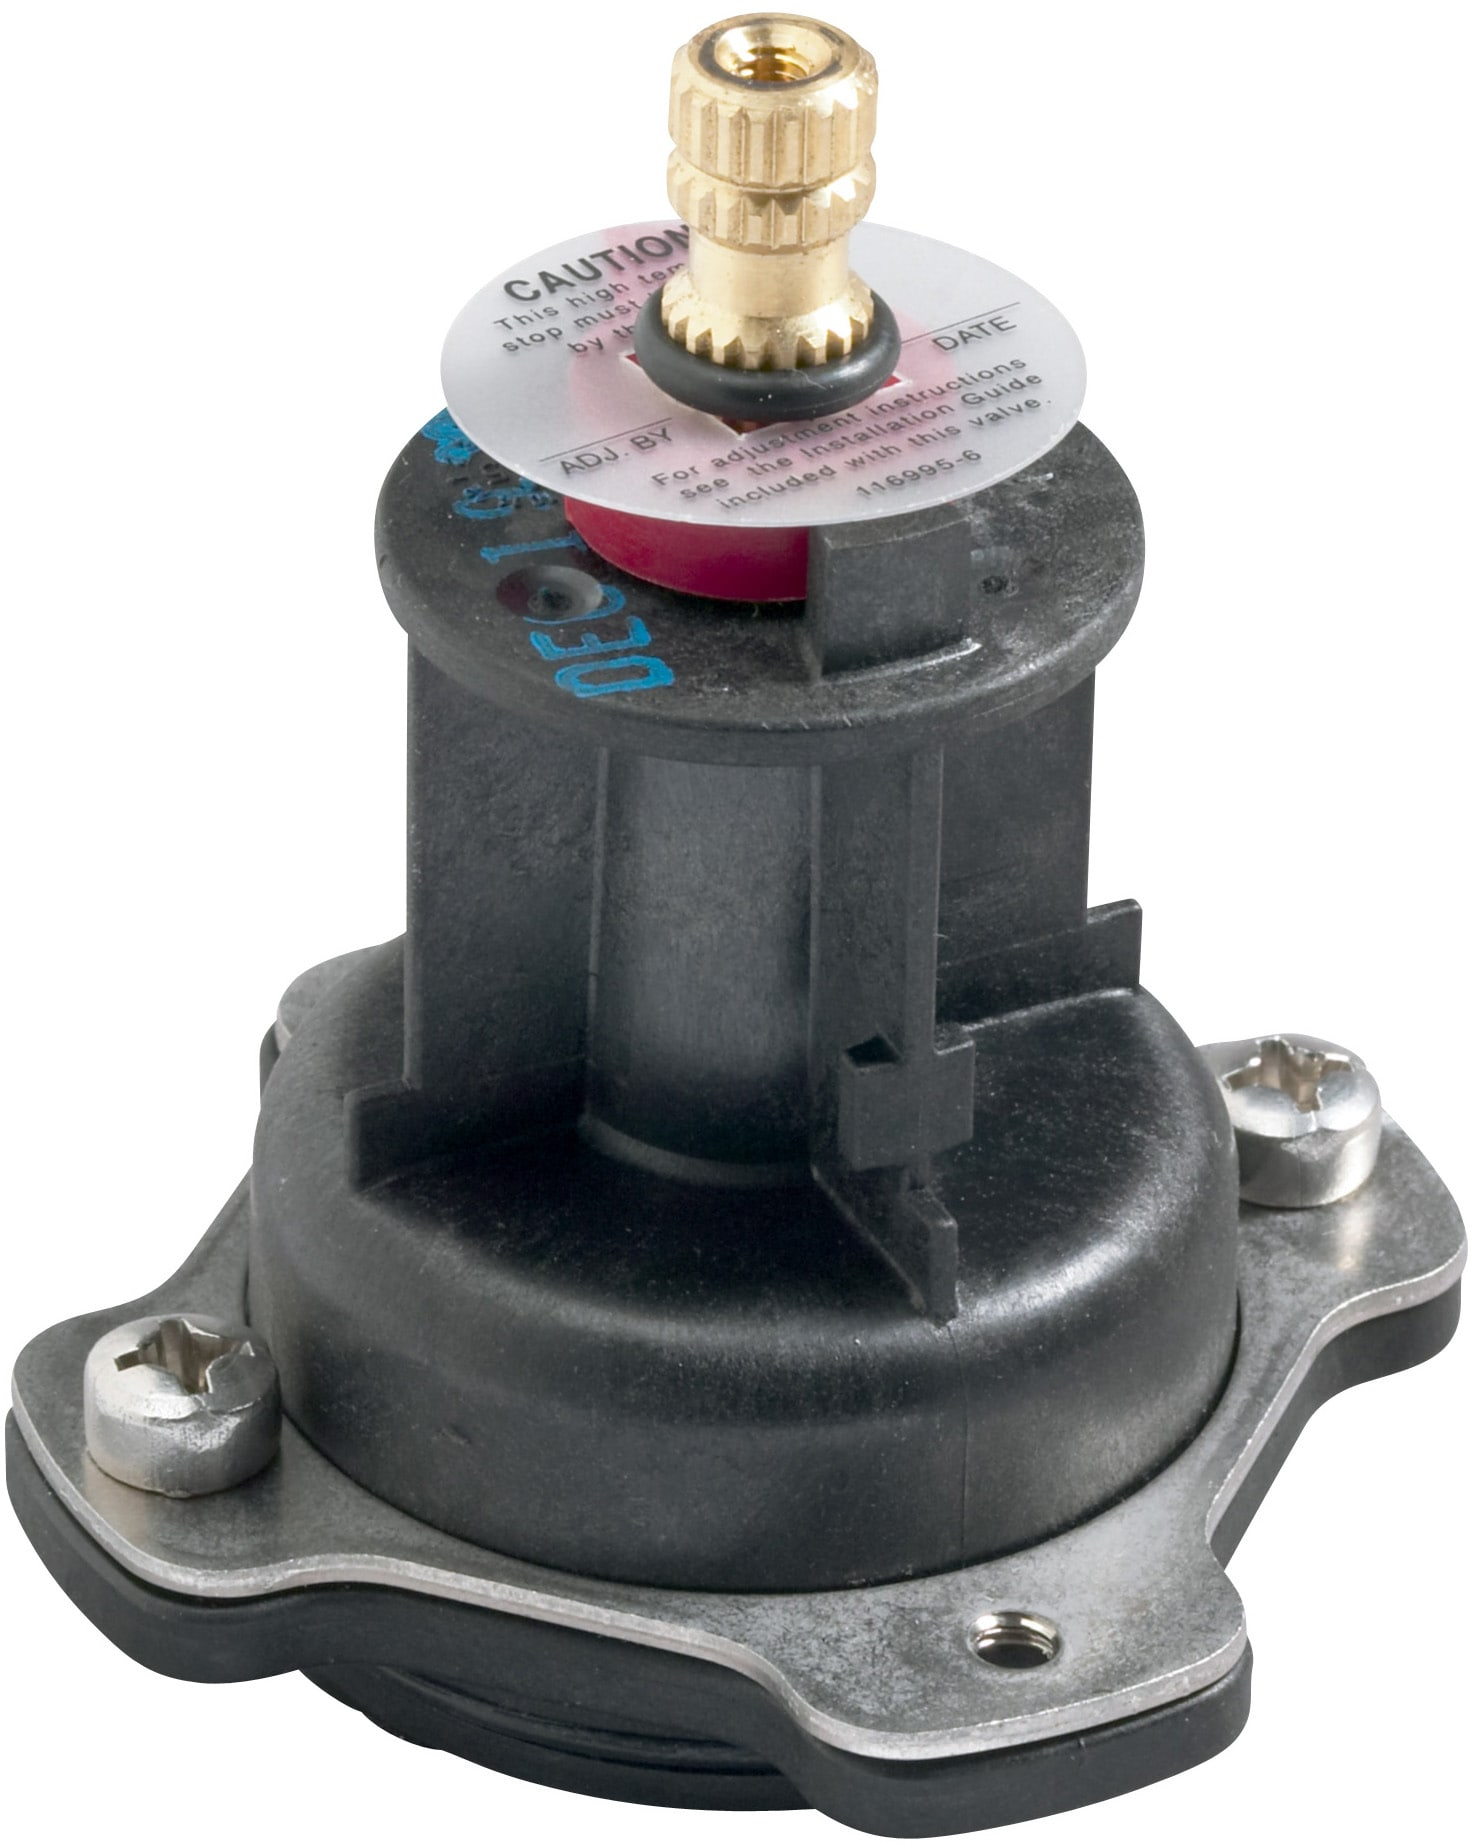 Kohler Plastic Tub Shower Repair Kit Most Kohler Shower Valves In The Faucet Repair Kits Components Department At Lowes Com